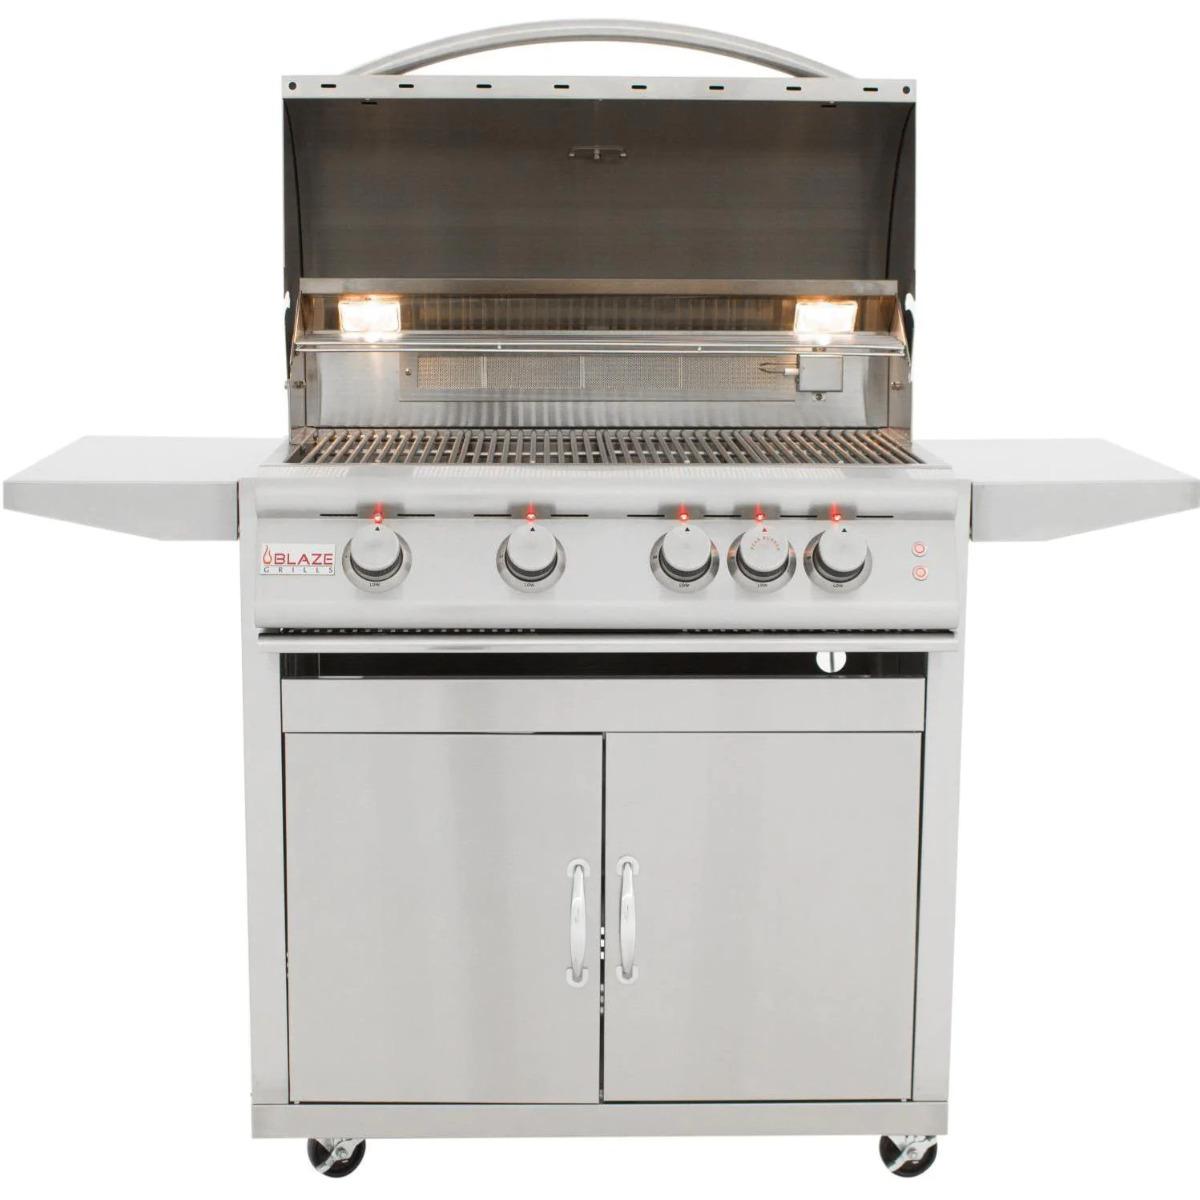 Blaze Premium LTE 32-Inch 4-Burner Freestanding Natural Gas Grill with Rotisserie, Rear Infrared Burner & Grill Lights - blz-4lte2-ng-rt+blz-4-cart